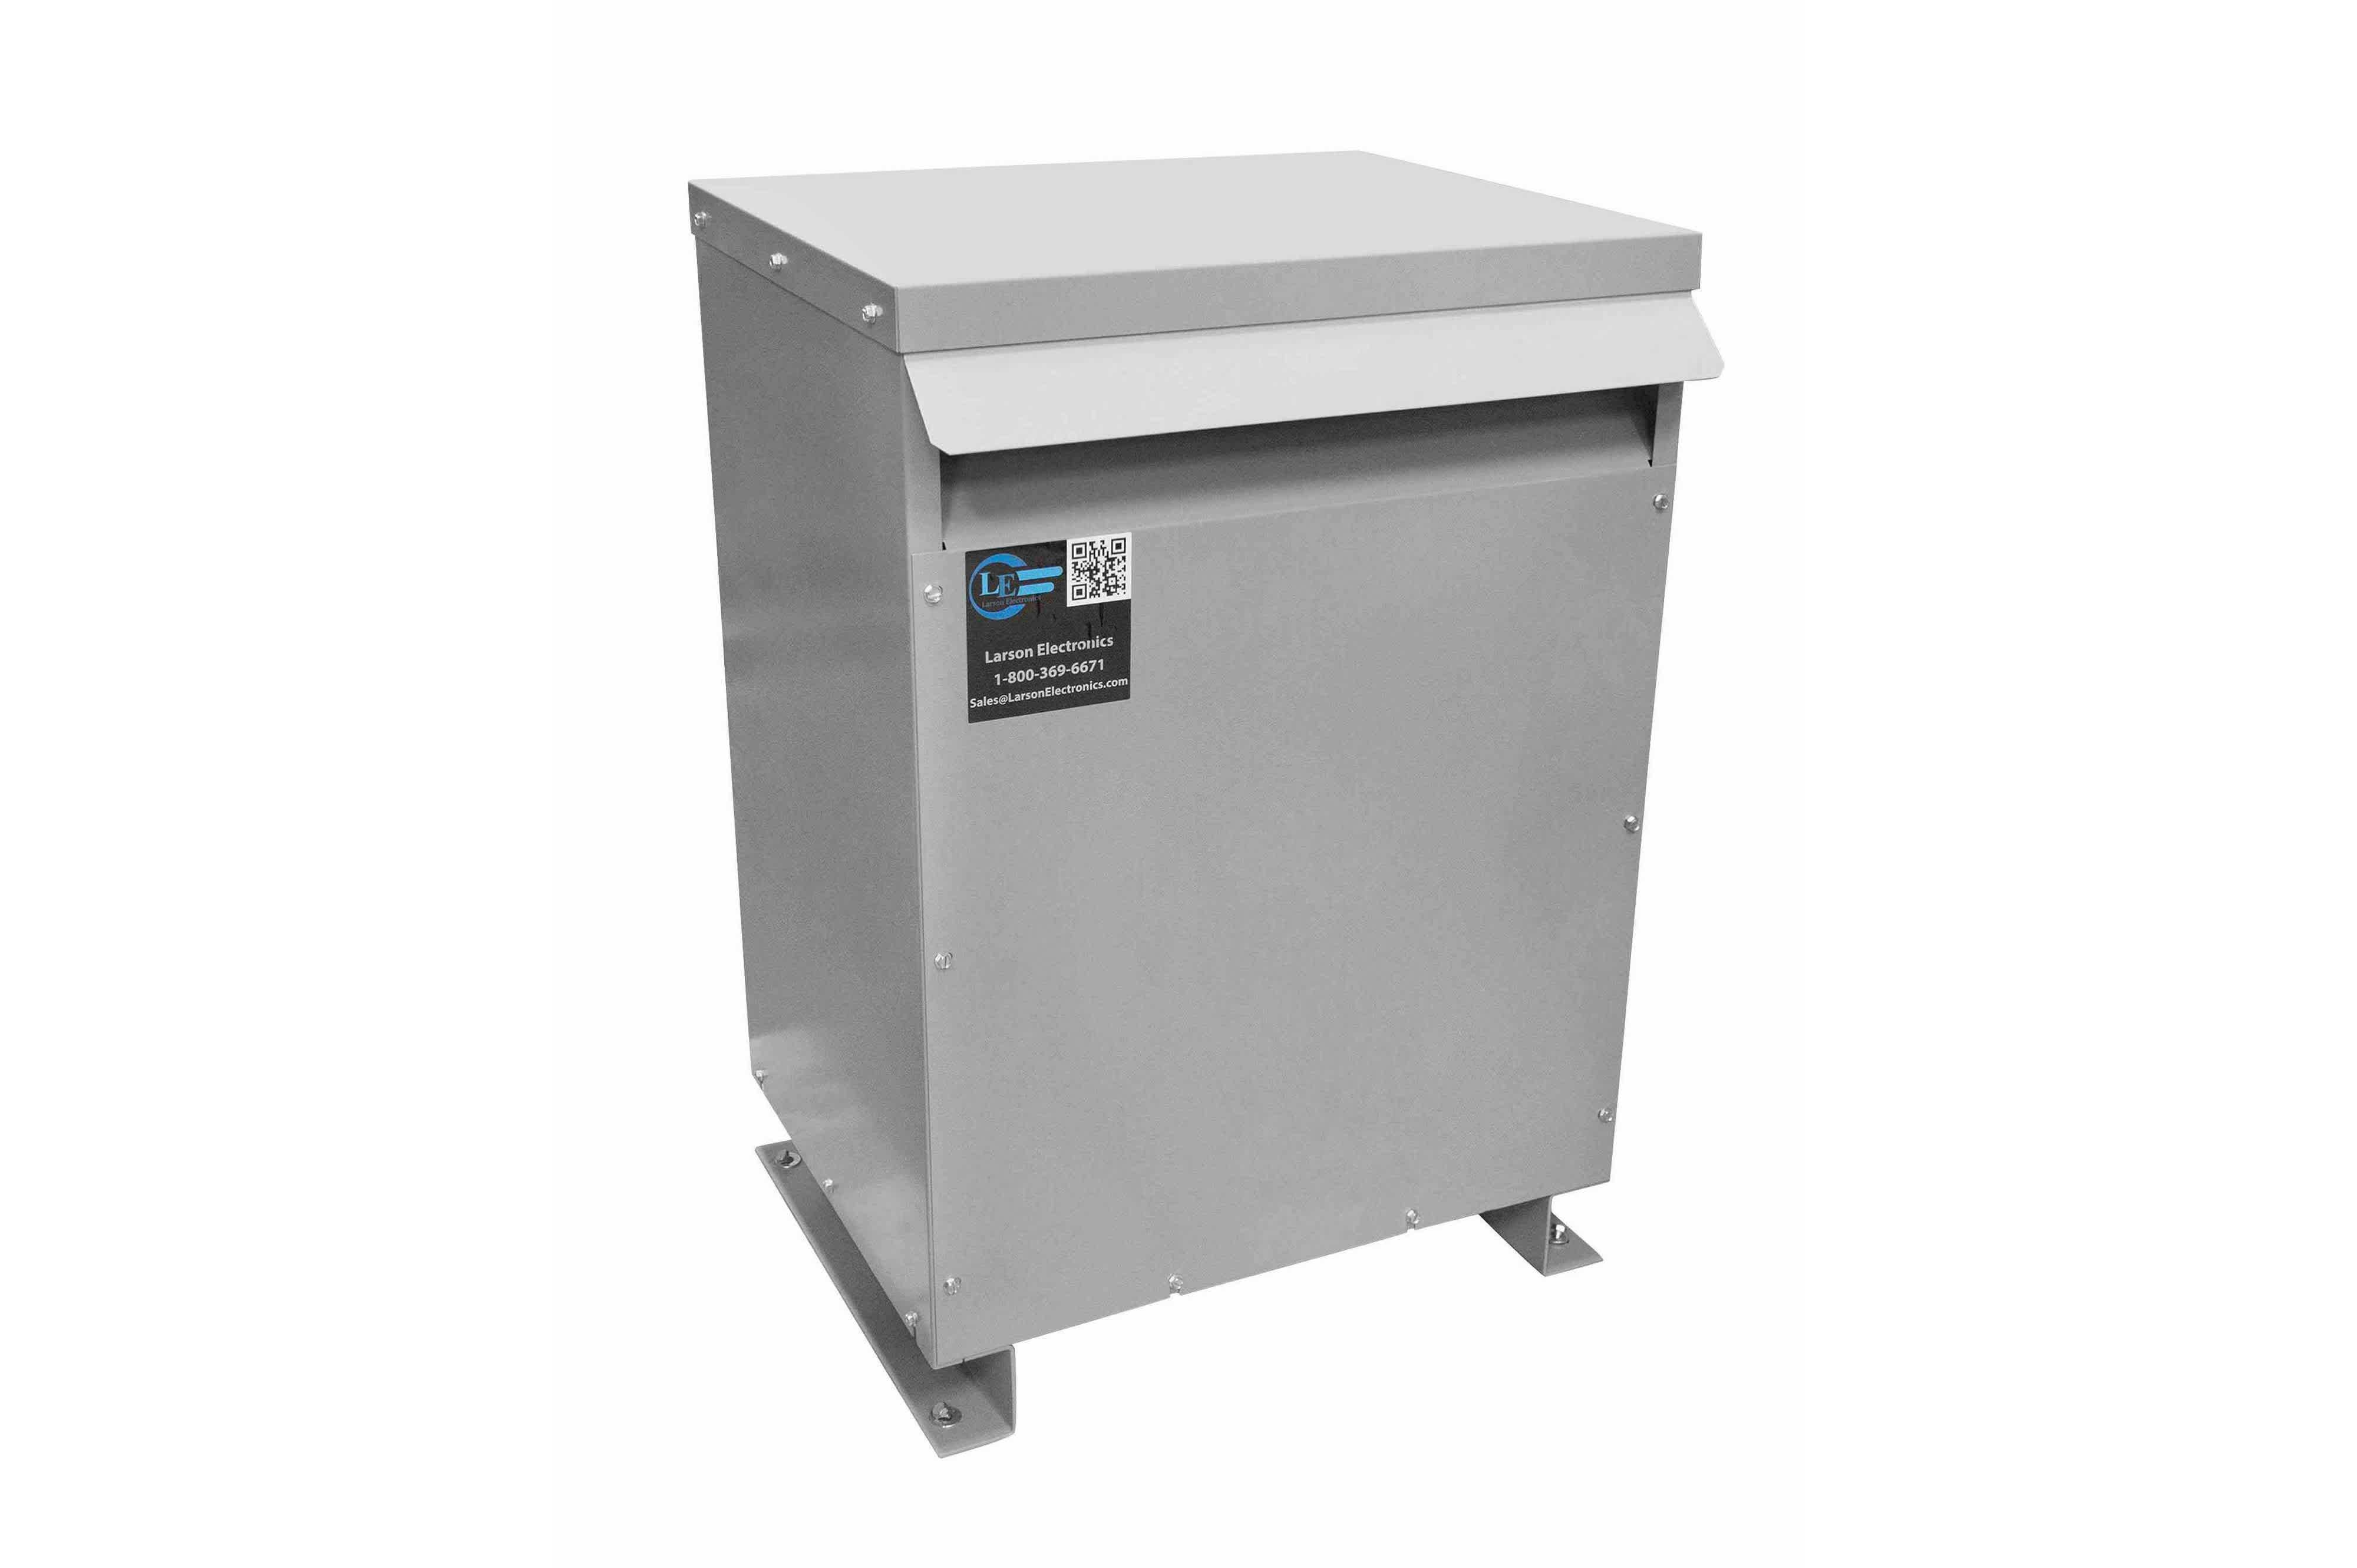 500 kVA 3PH Isolation Transformer, 400V Wye Primary, 240V Delta Secondary, N3R, Ventilated, 60 Hz